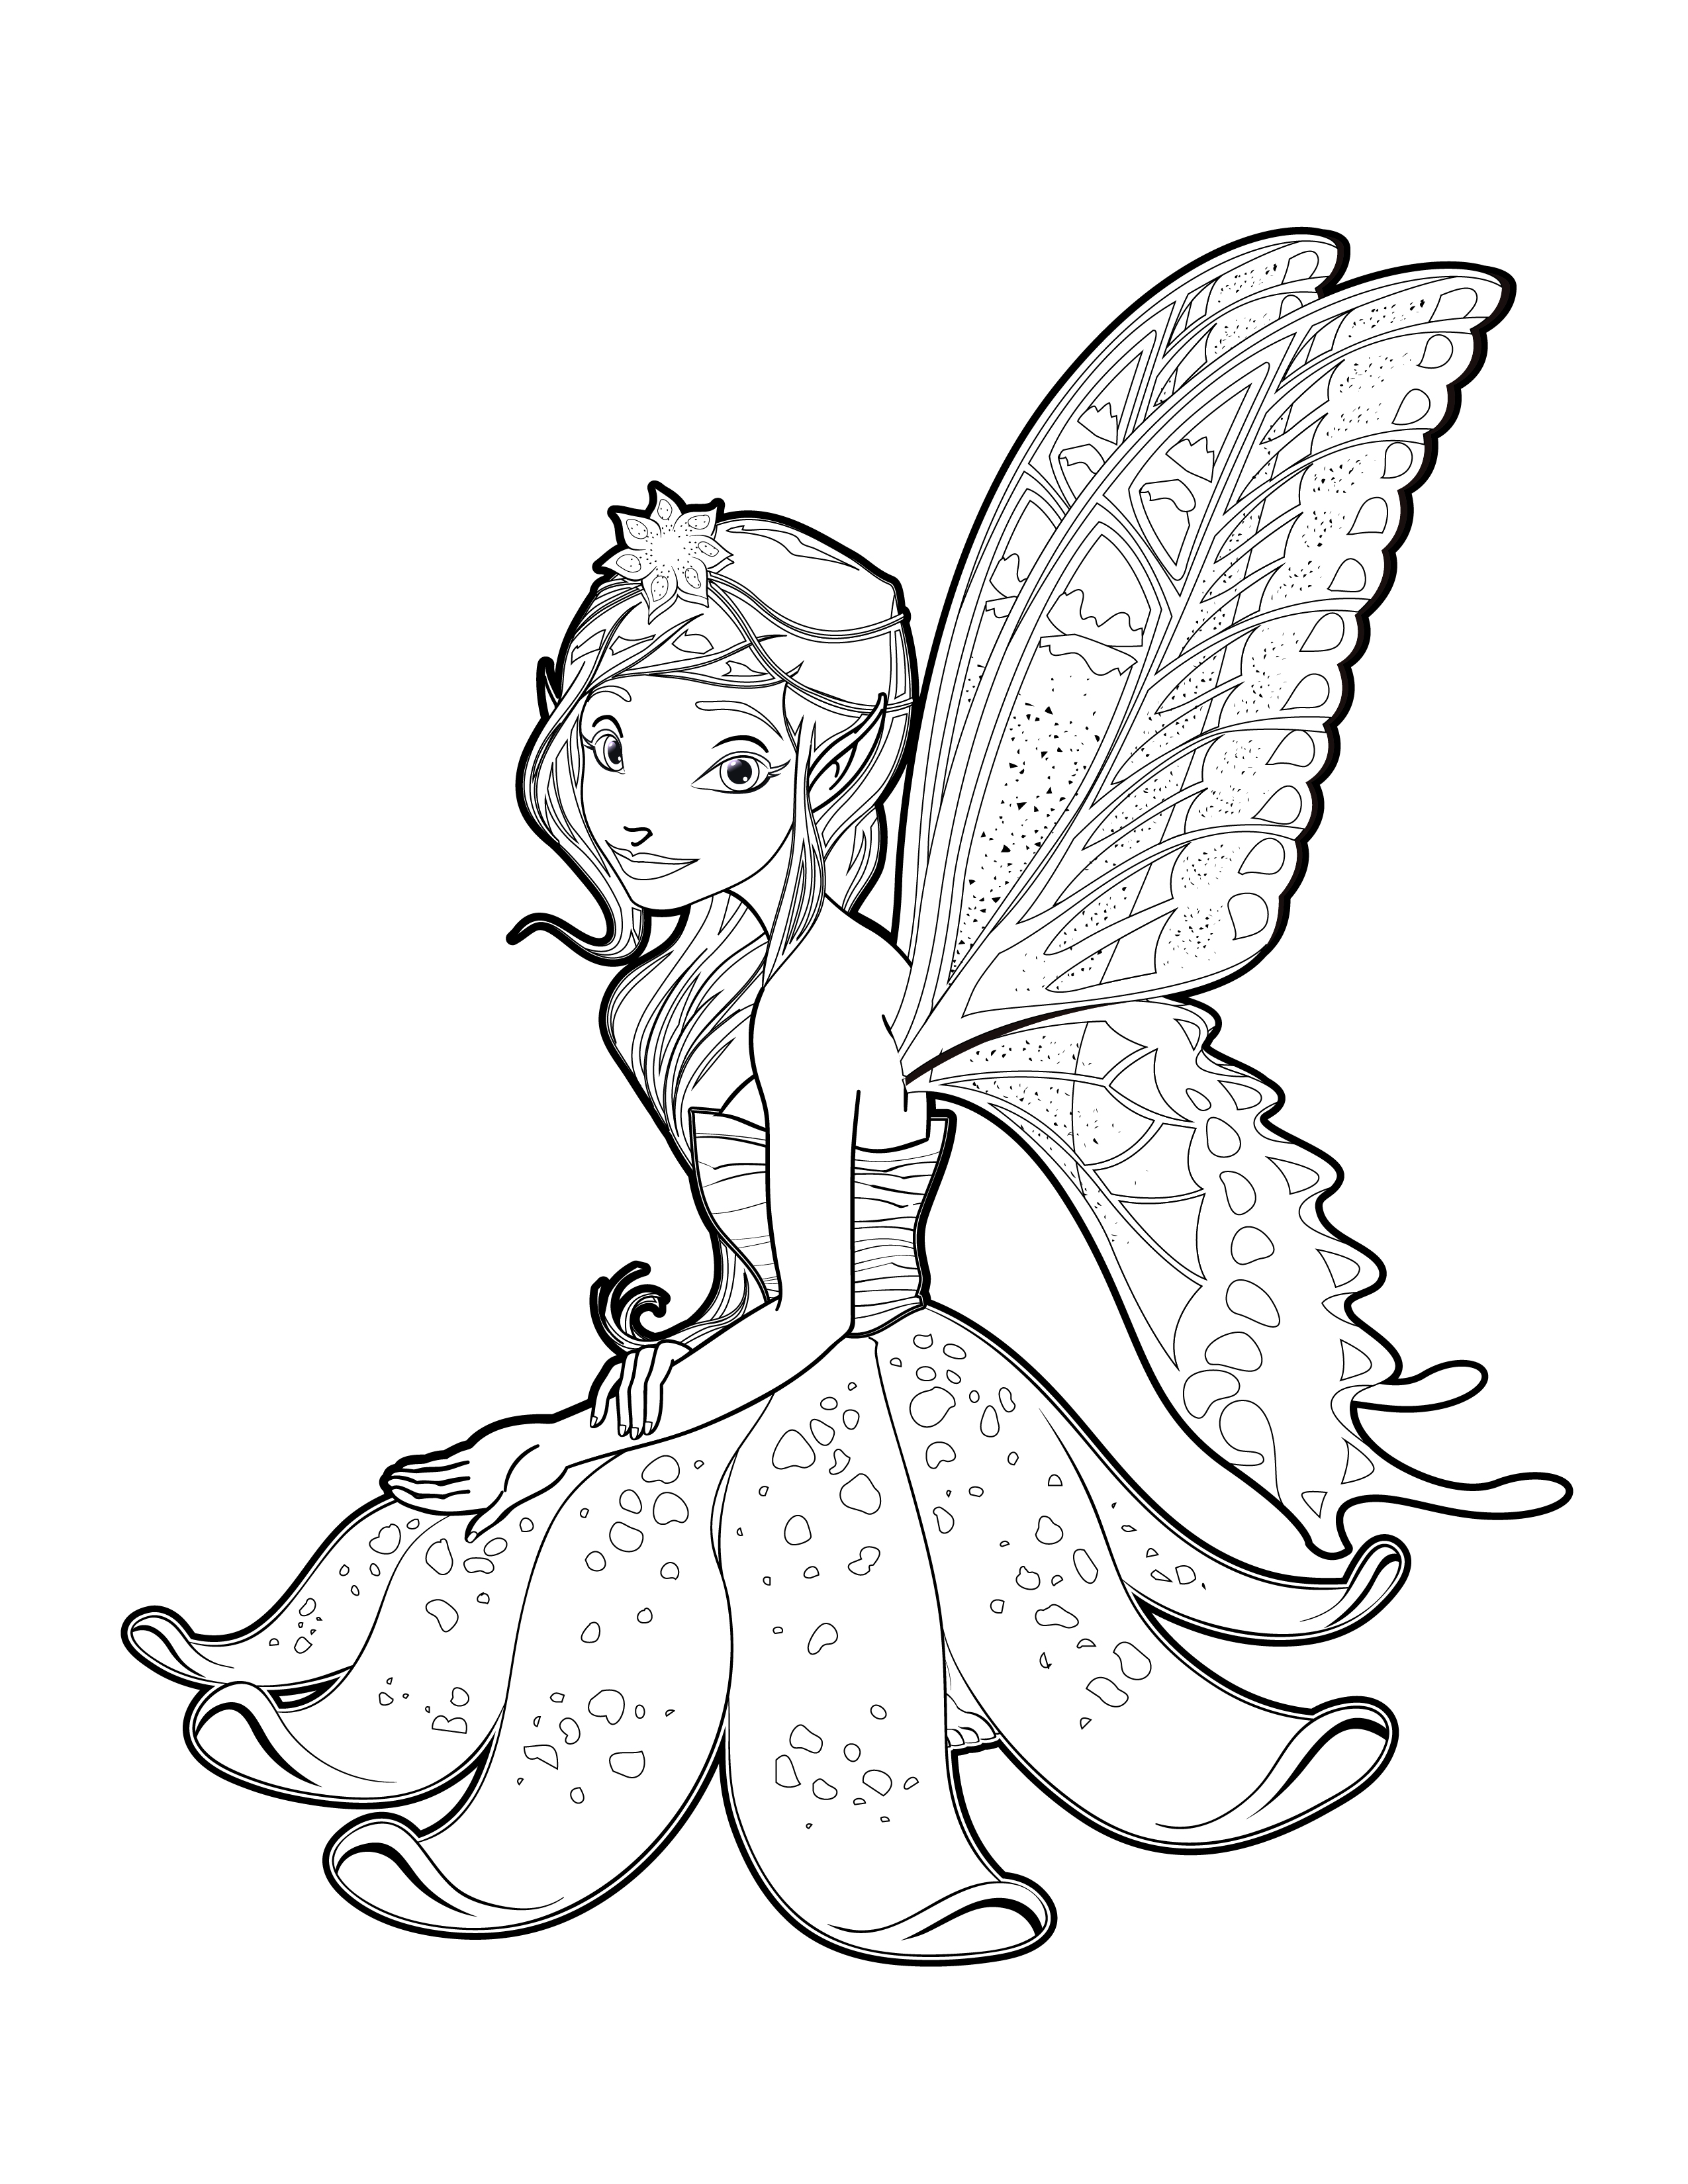 imprimer coloriage pour adulte fée clochette - Artherapie.ca